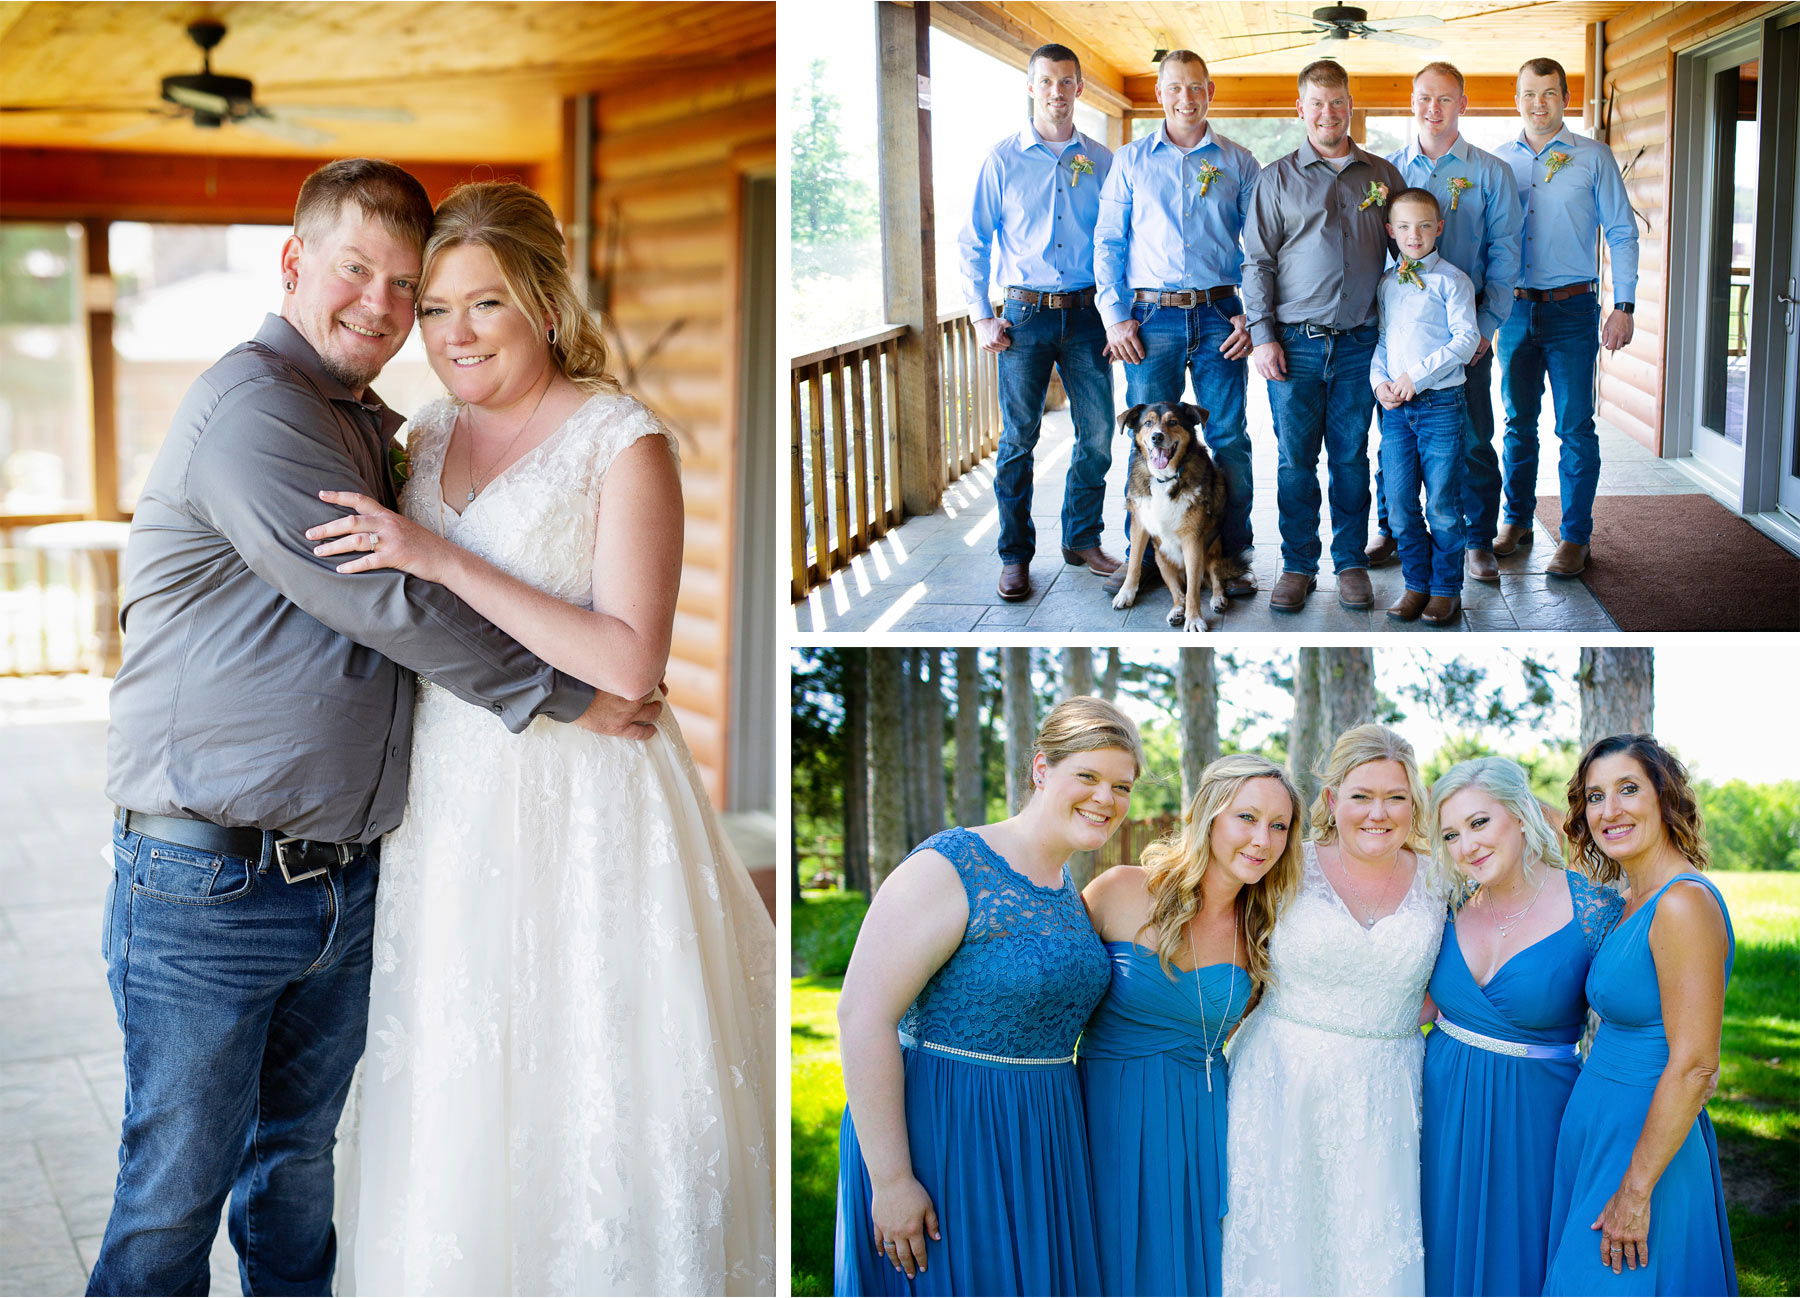 04-Vick-Photography-Wedding-Brainerd-Minnesota-Pine-Peaks-Lodge-Cabin-Rustic-Bridesmaids-Groomsmen-Kristi-and-Noel.jpg